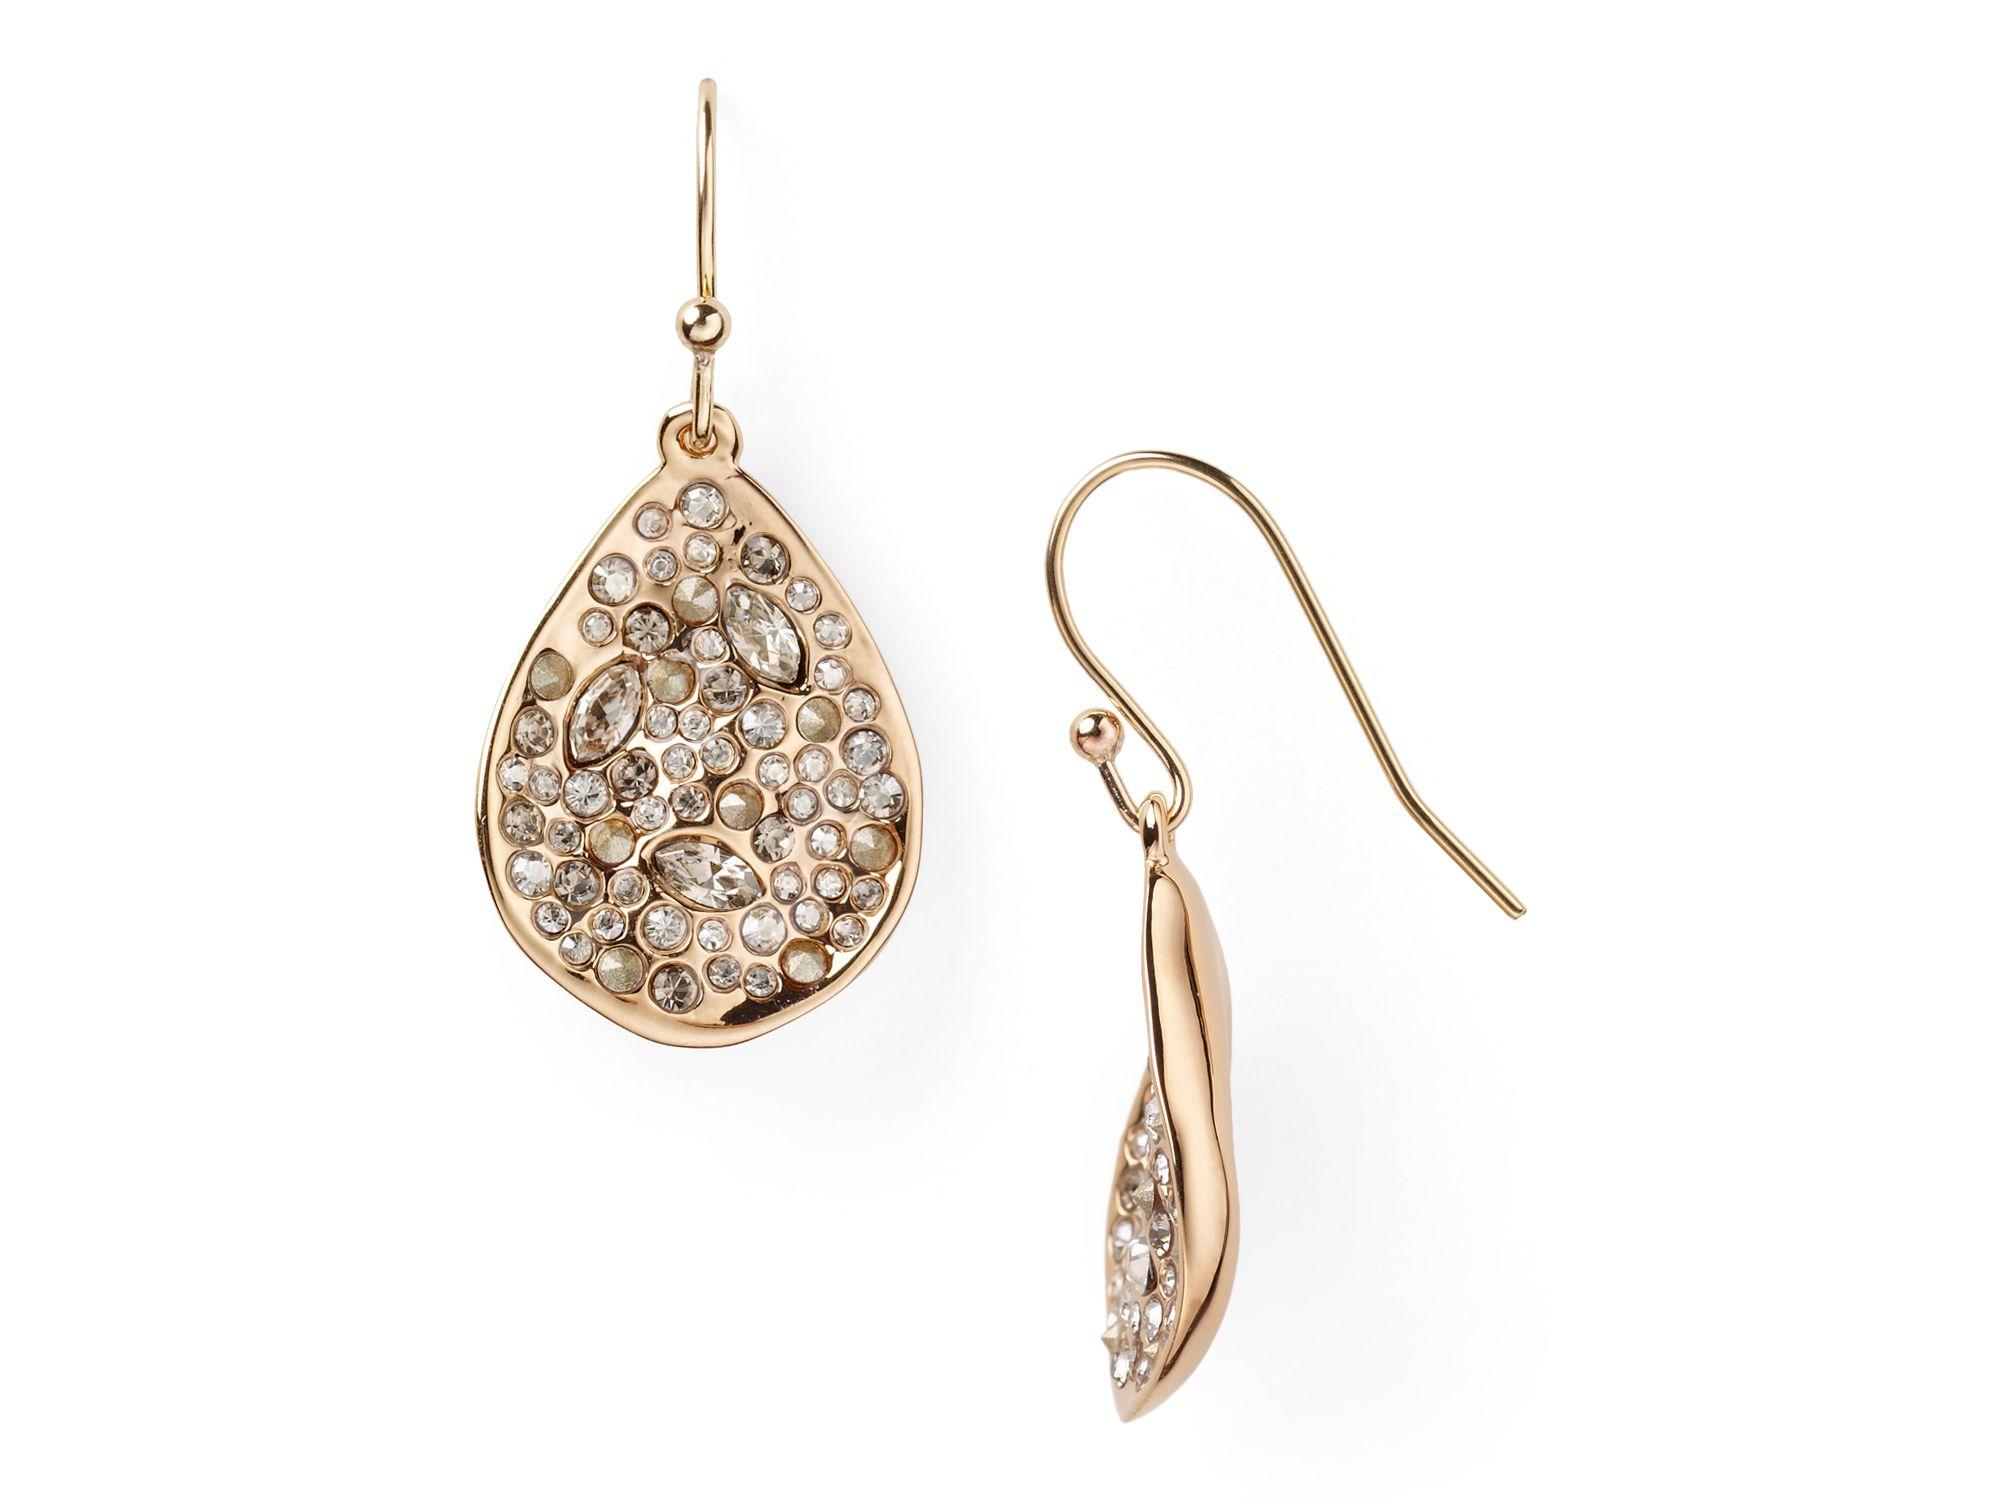 Alexis Bittar Crystal Encrusted Spiral Earring 5Y50Vv